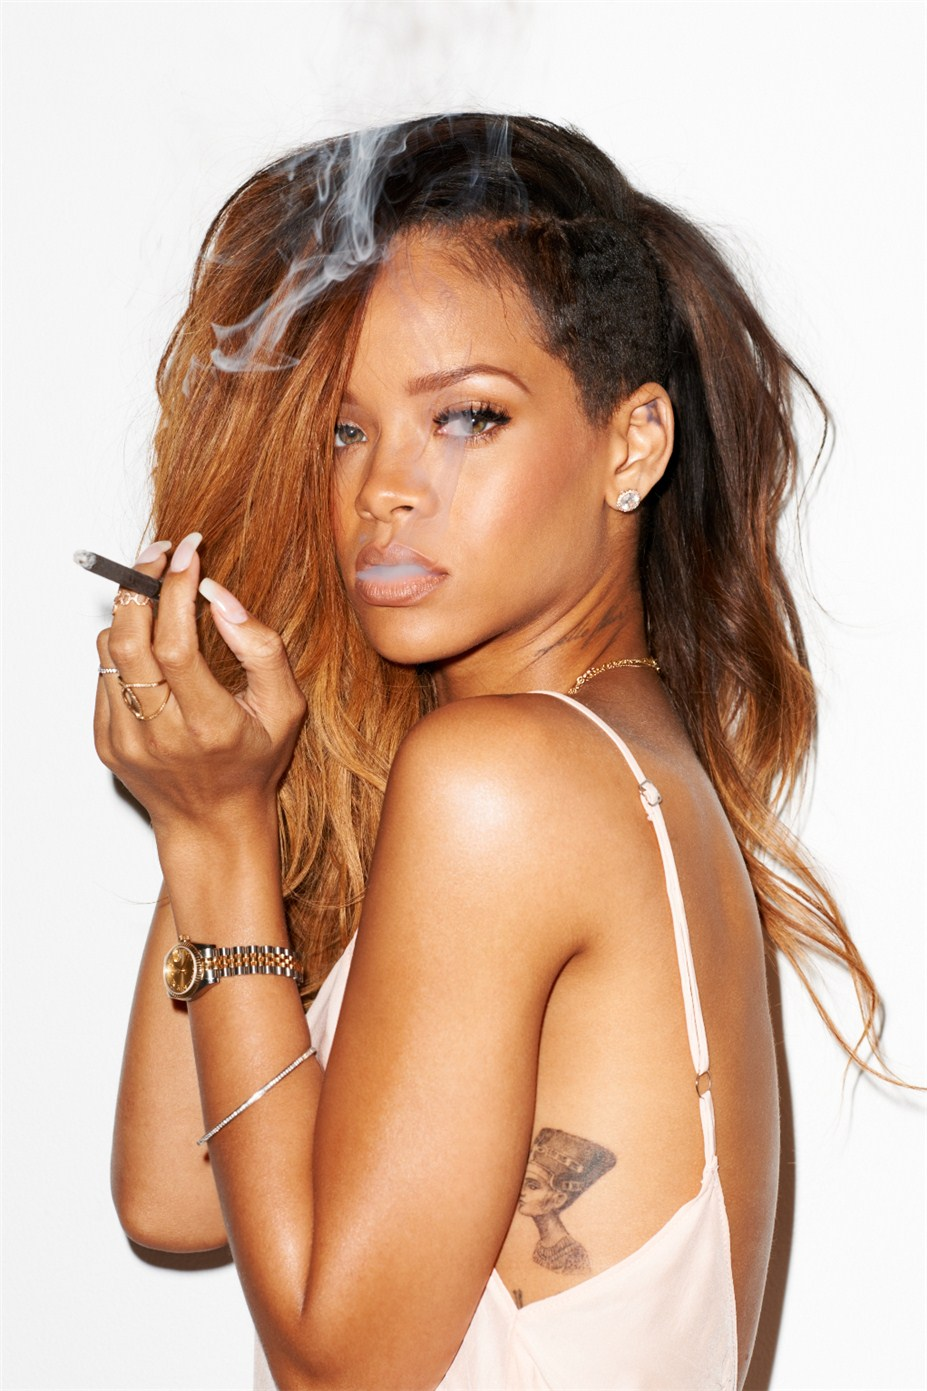 Rihanna / Рианна в дневнике фотографа Terry Richardson / фотографии для журнала Rolling Stone, февраль 2013